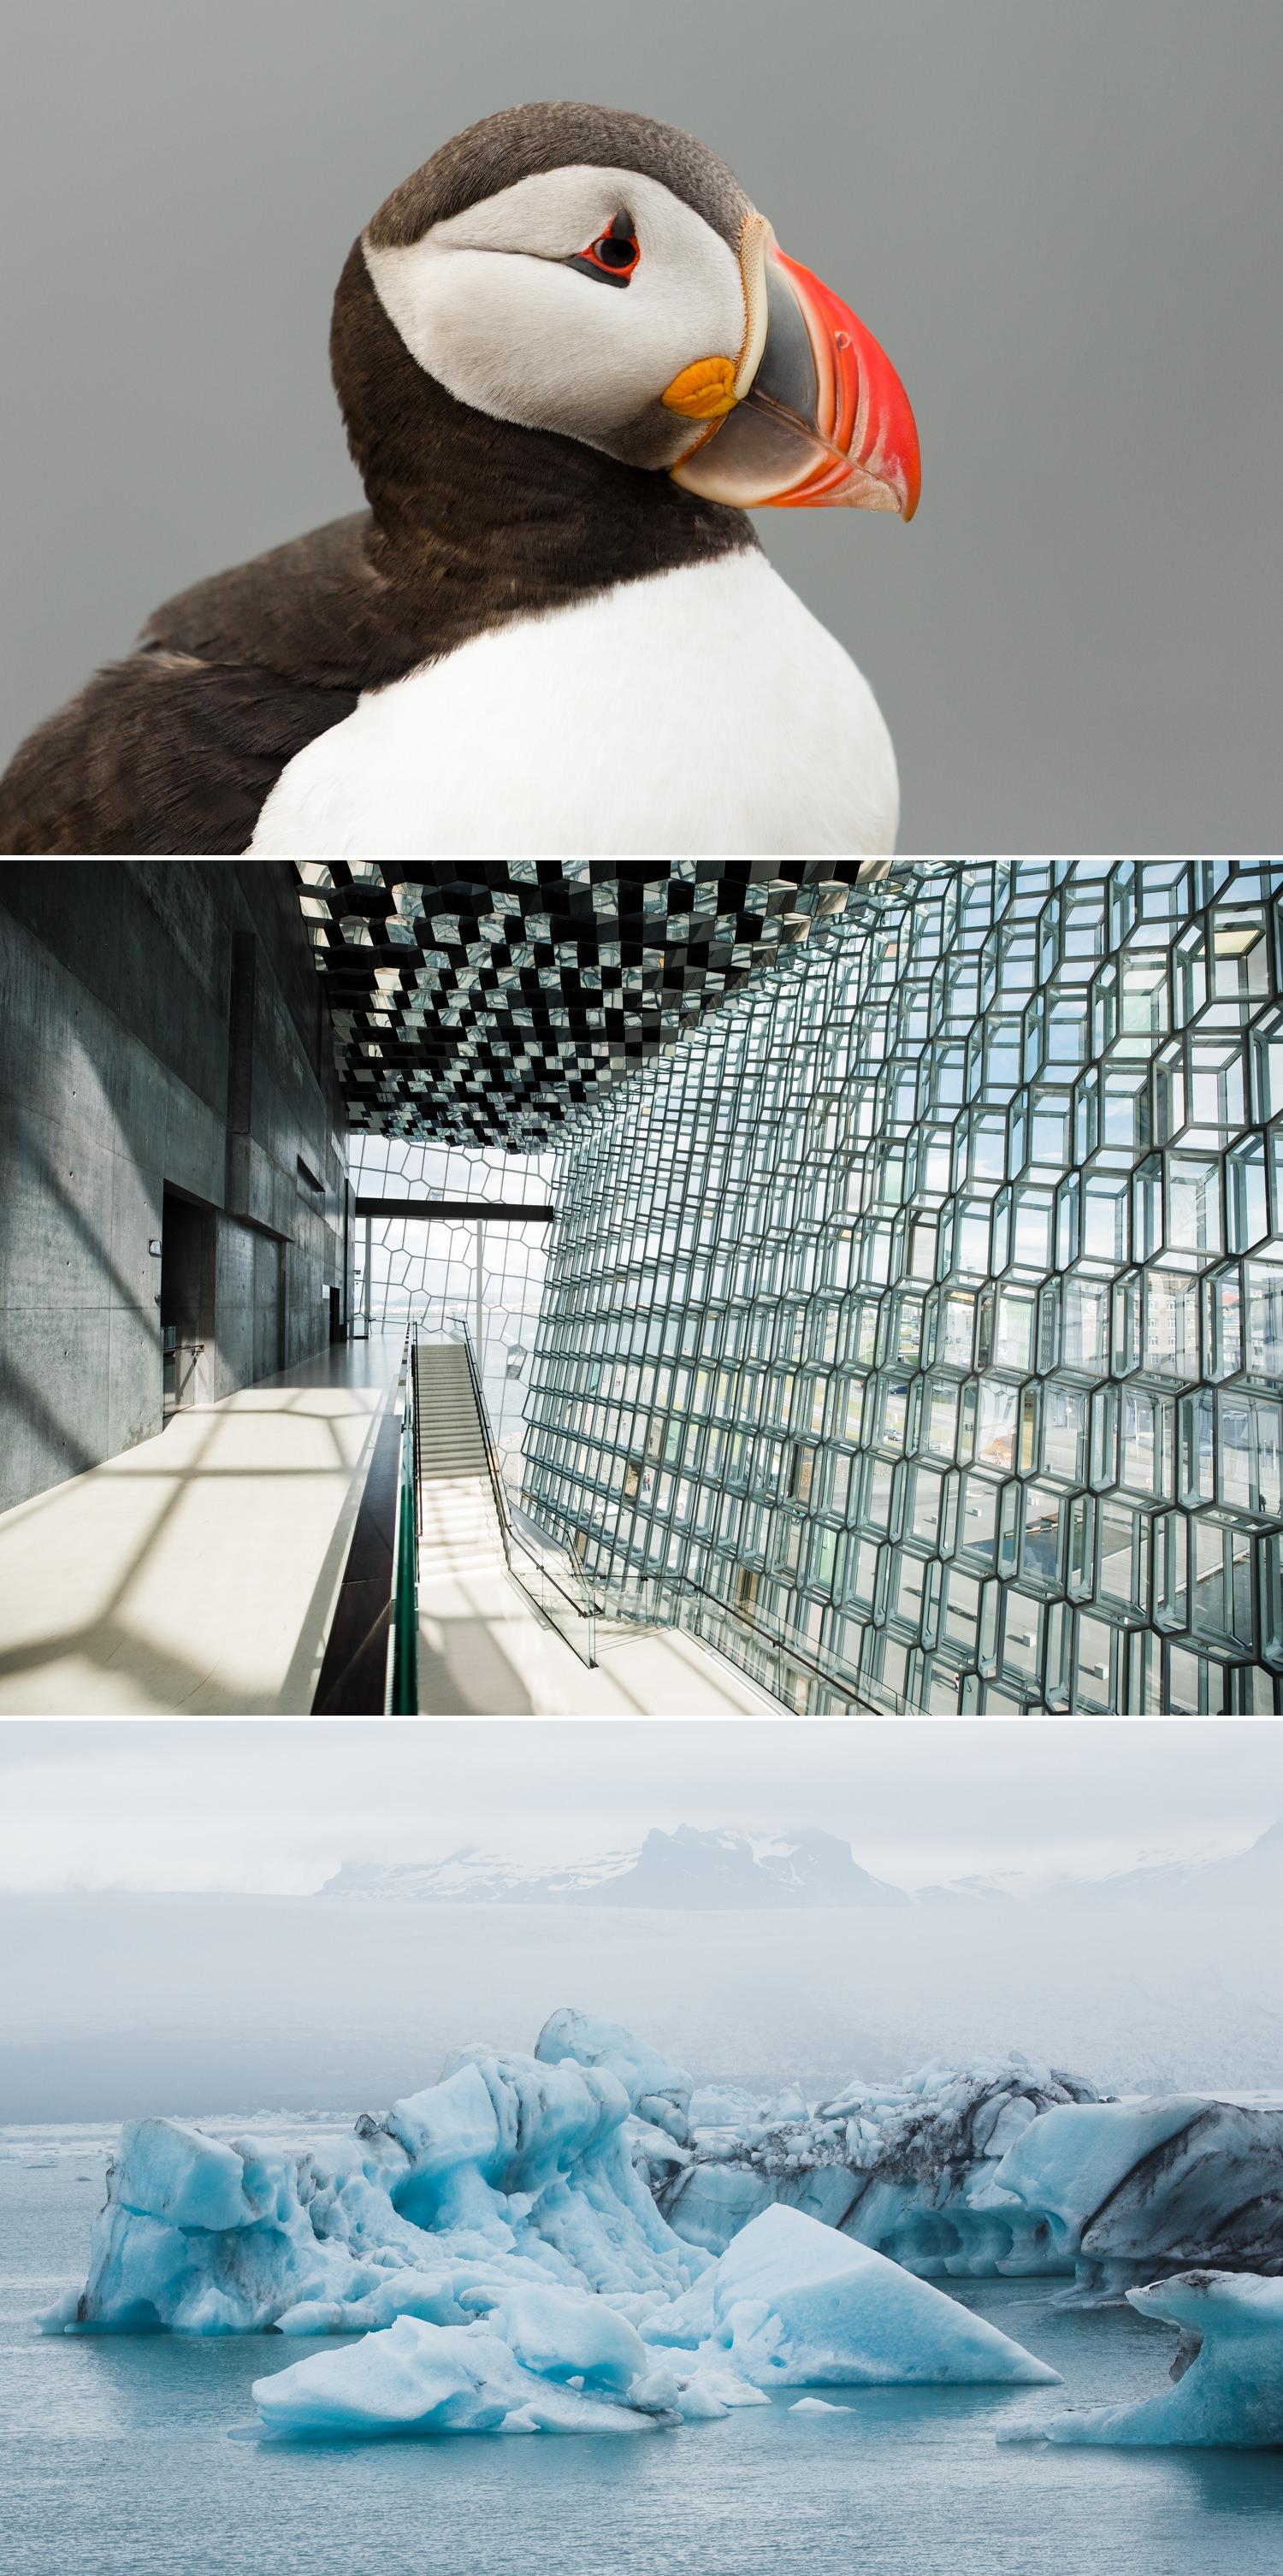 23-photography-workshop-iceland.jpg